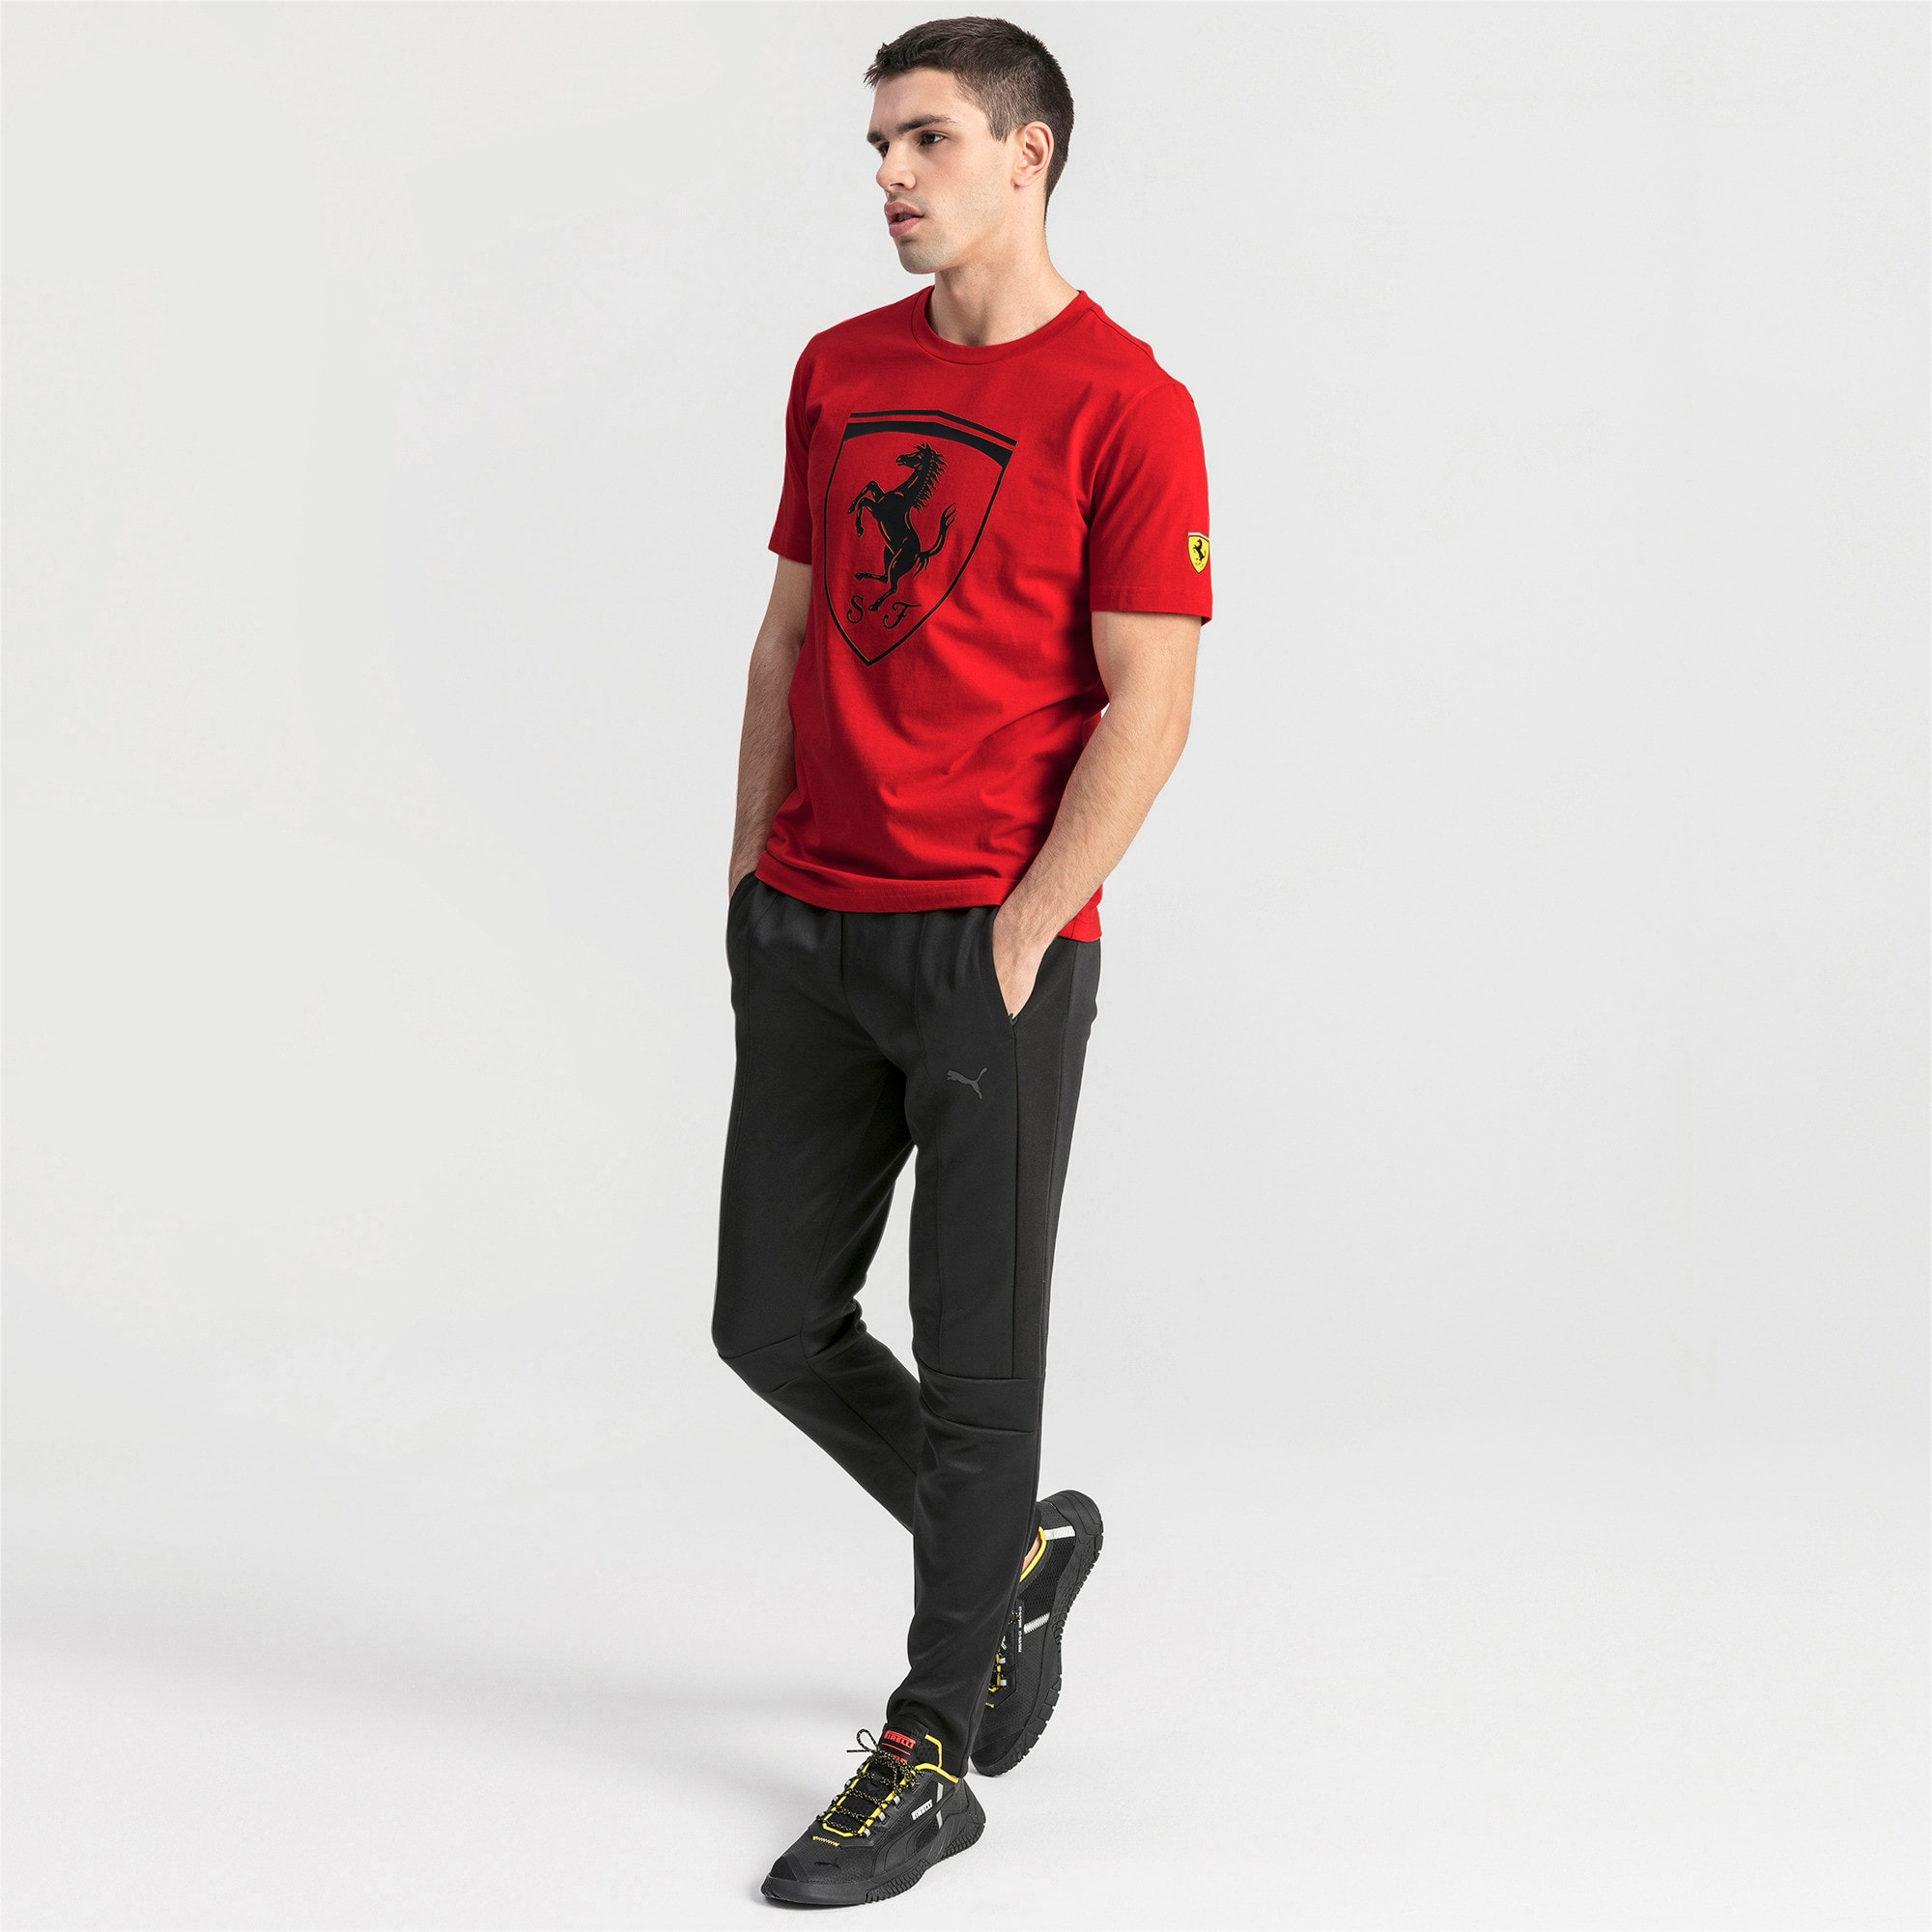 Thumbnail 3 of Ferrari T7 Men's Track Pants, Puma Black, medium